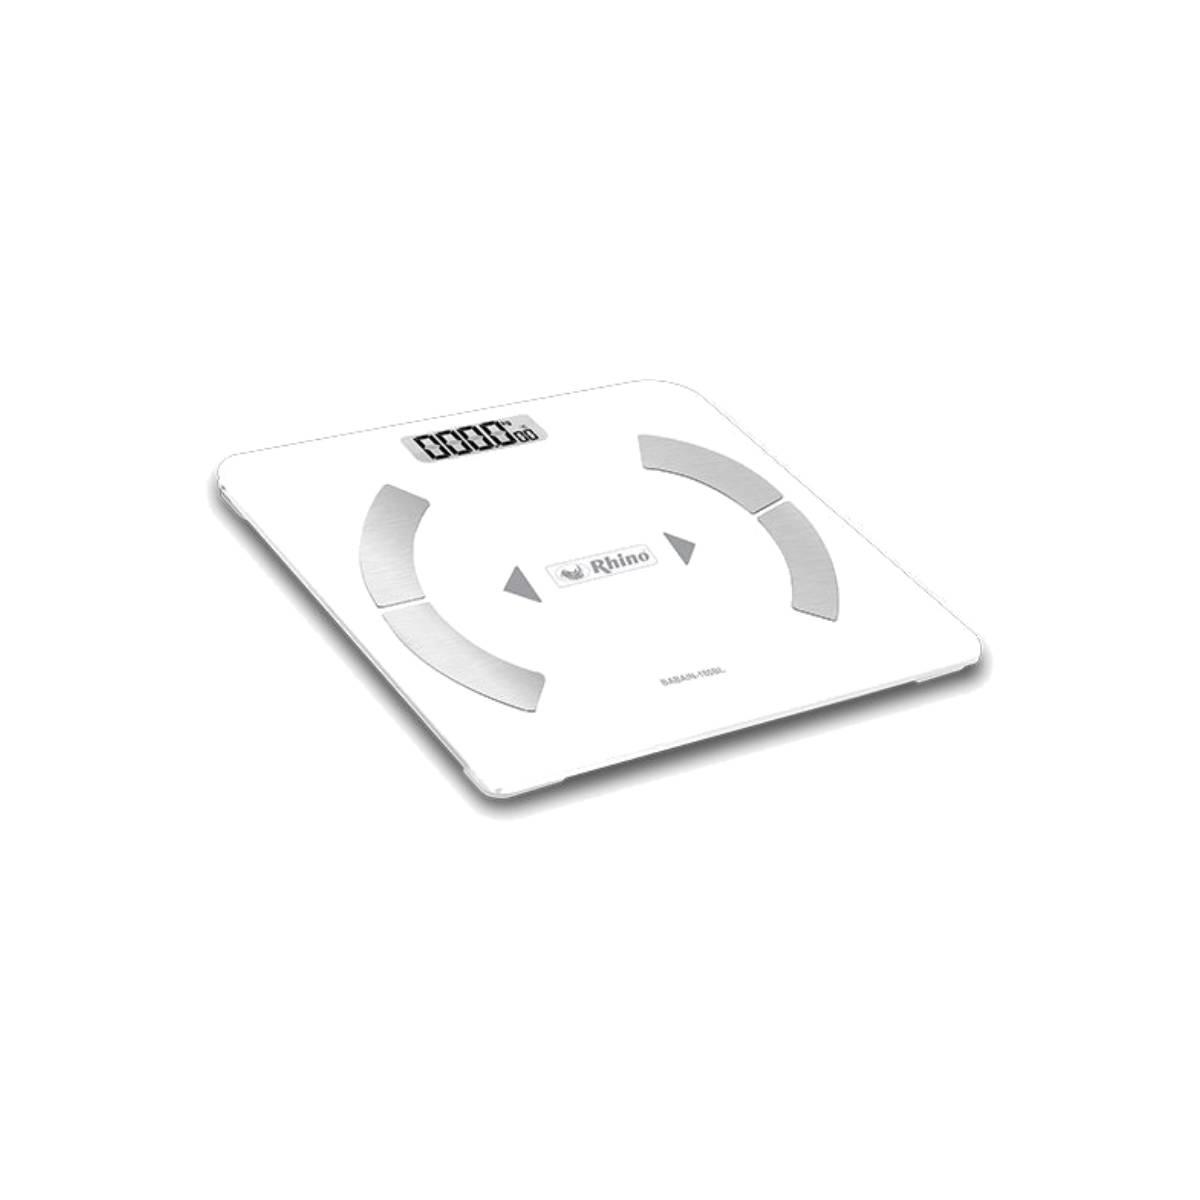 Bascula Intelige Corporal Bluetooth 180kg a100g Blanca Rhino